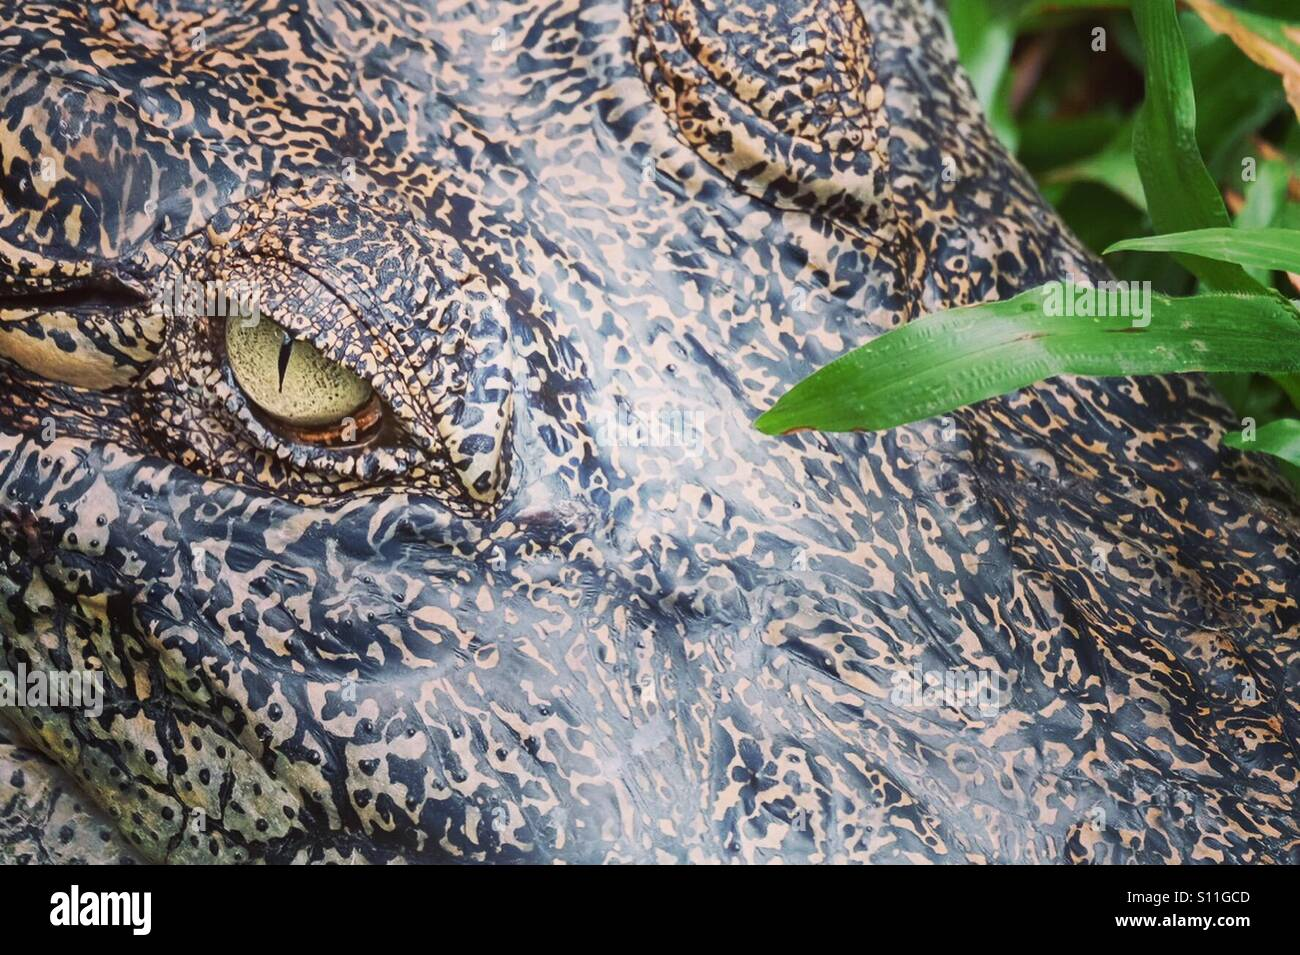 Close up of crododile eye, looking menacing. - Stock Image